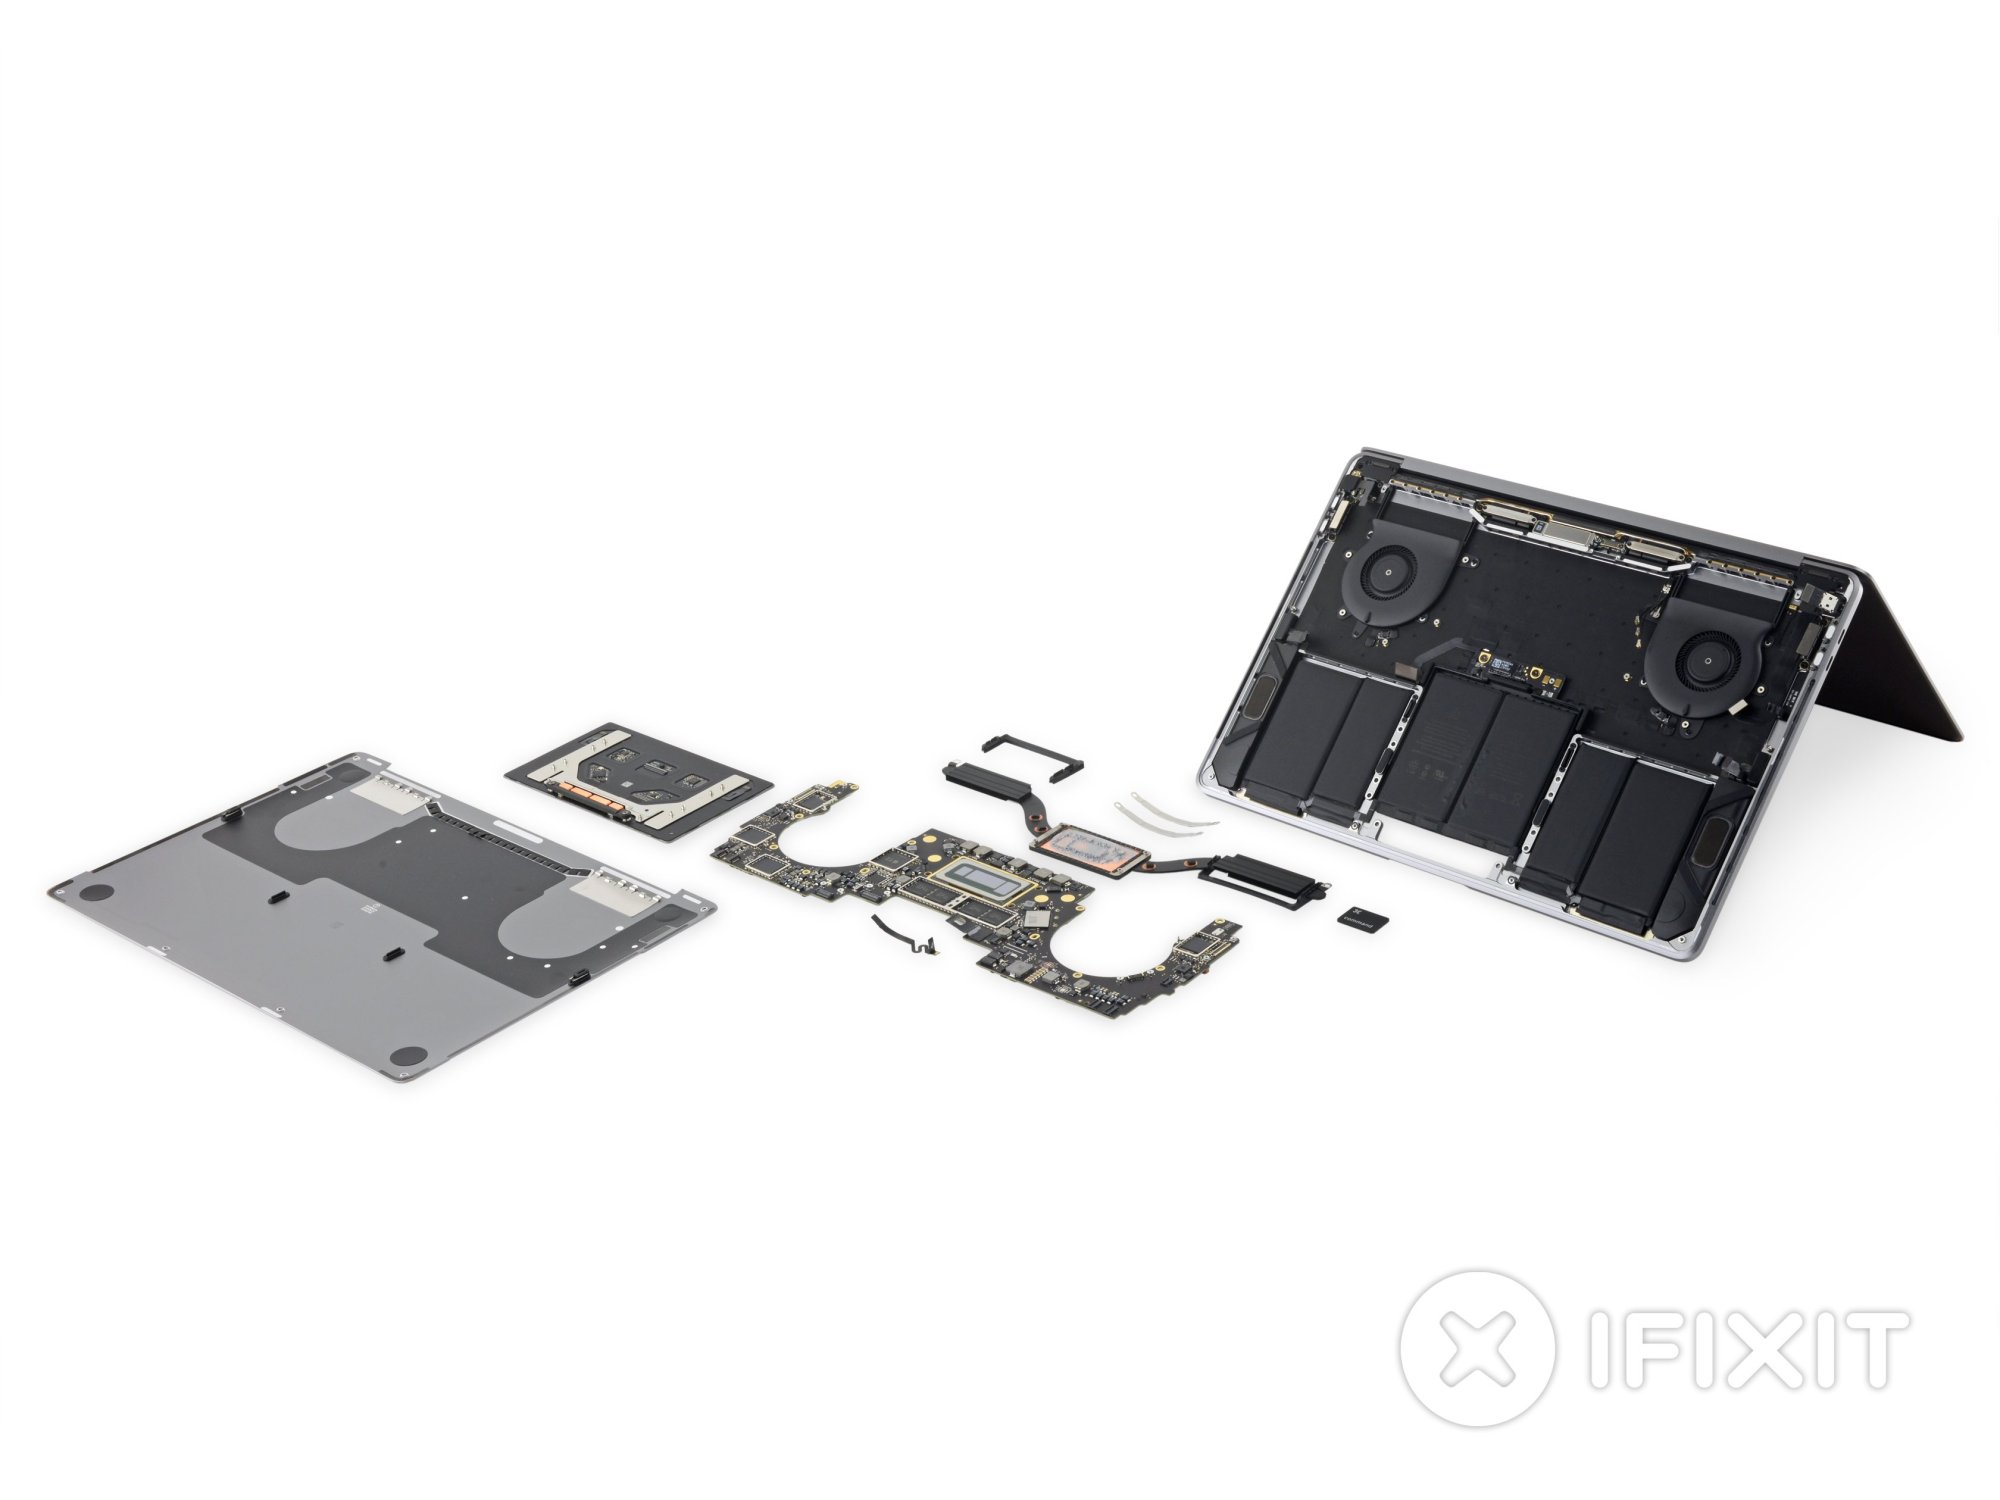 hight resolution of macbook pro 13 touch bar 2018 teardown